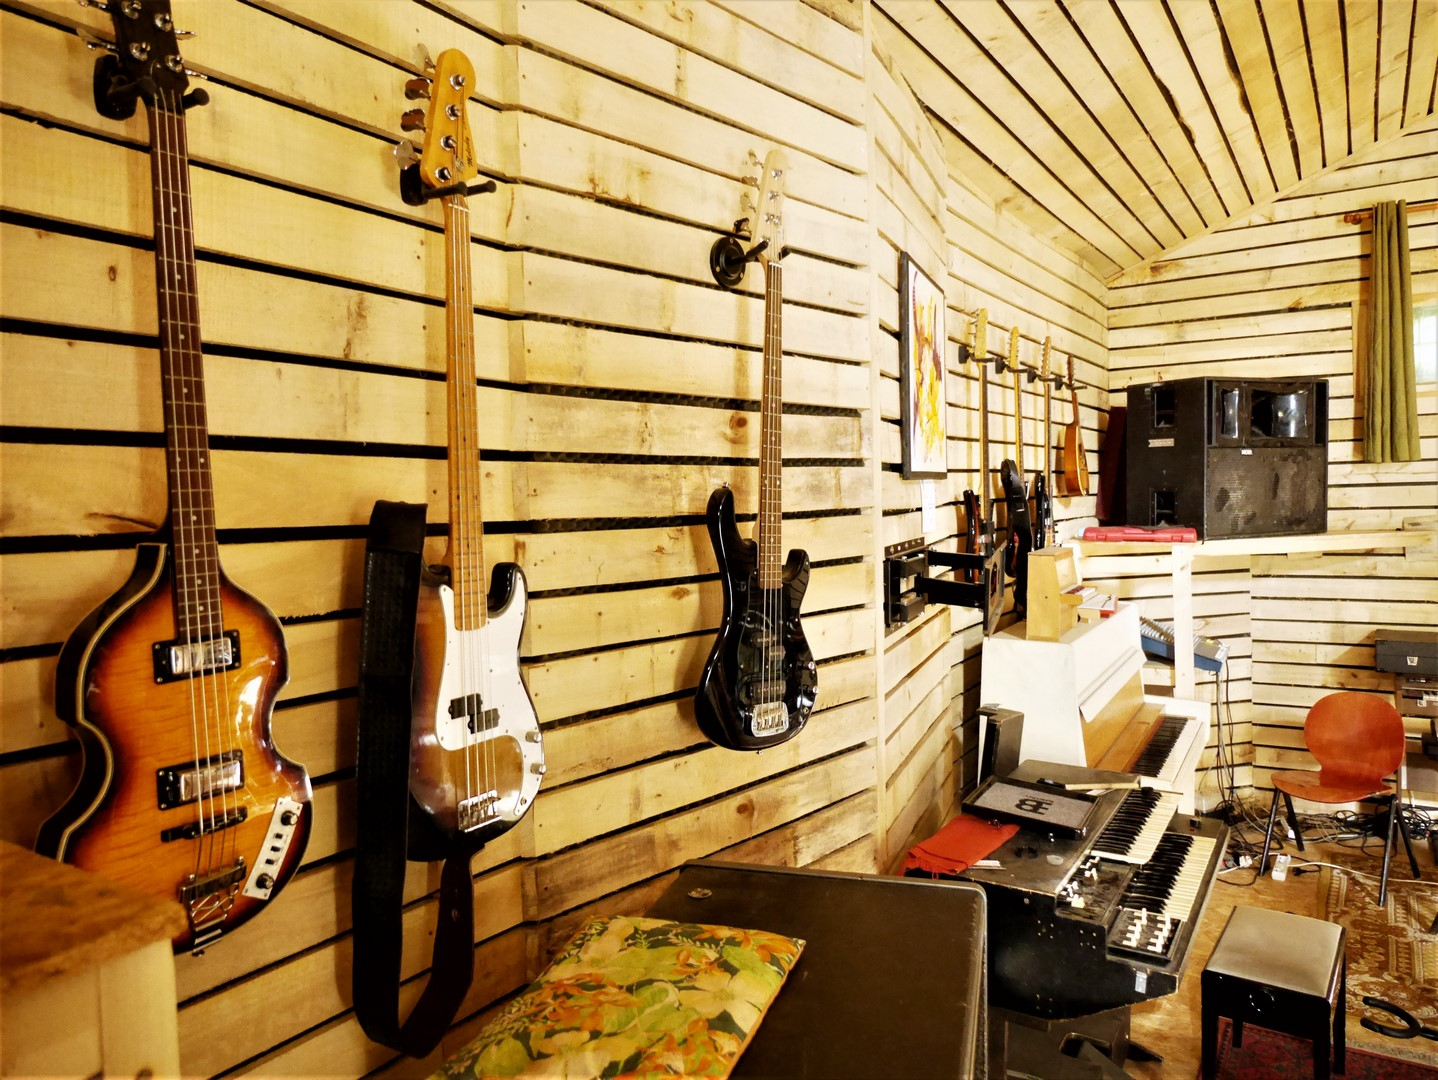 studio-la-boite-a-meuh-oct-2019-guitares